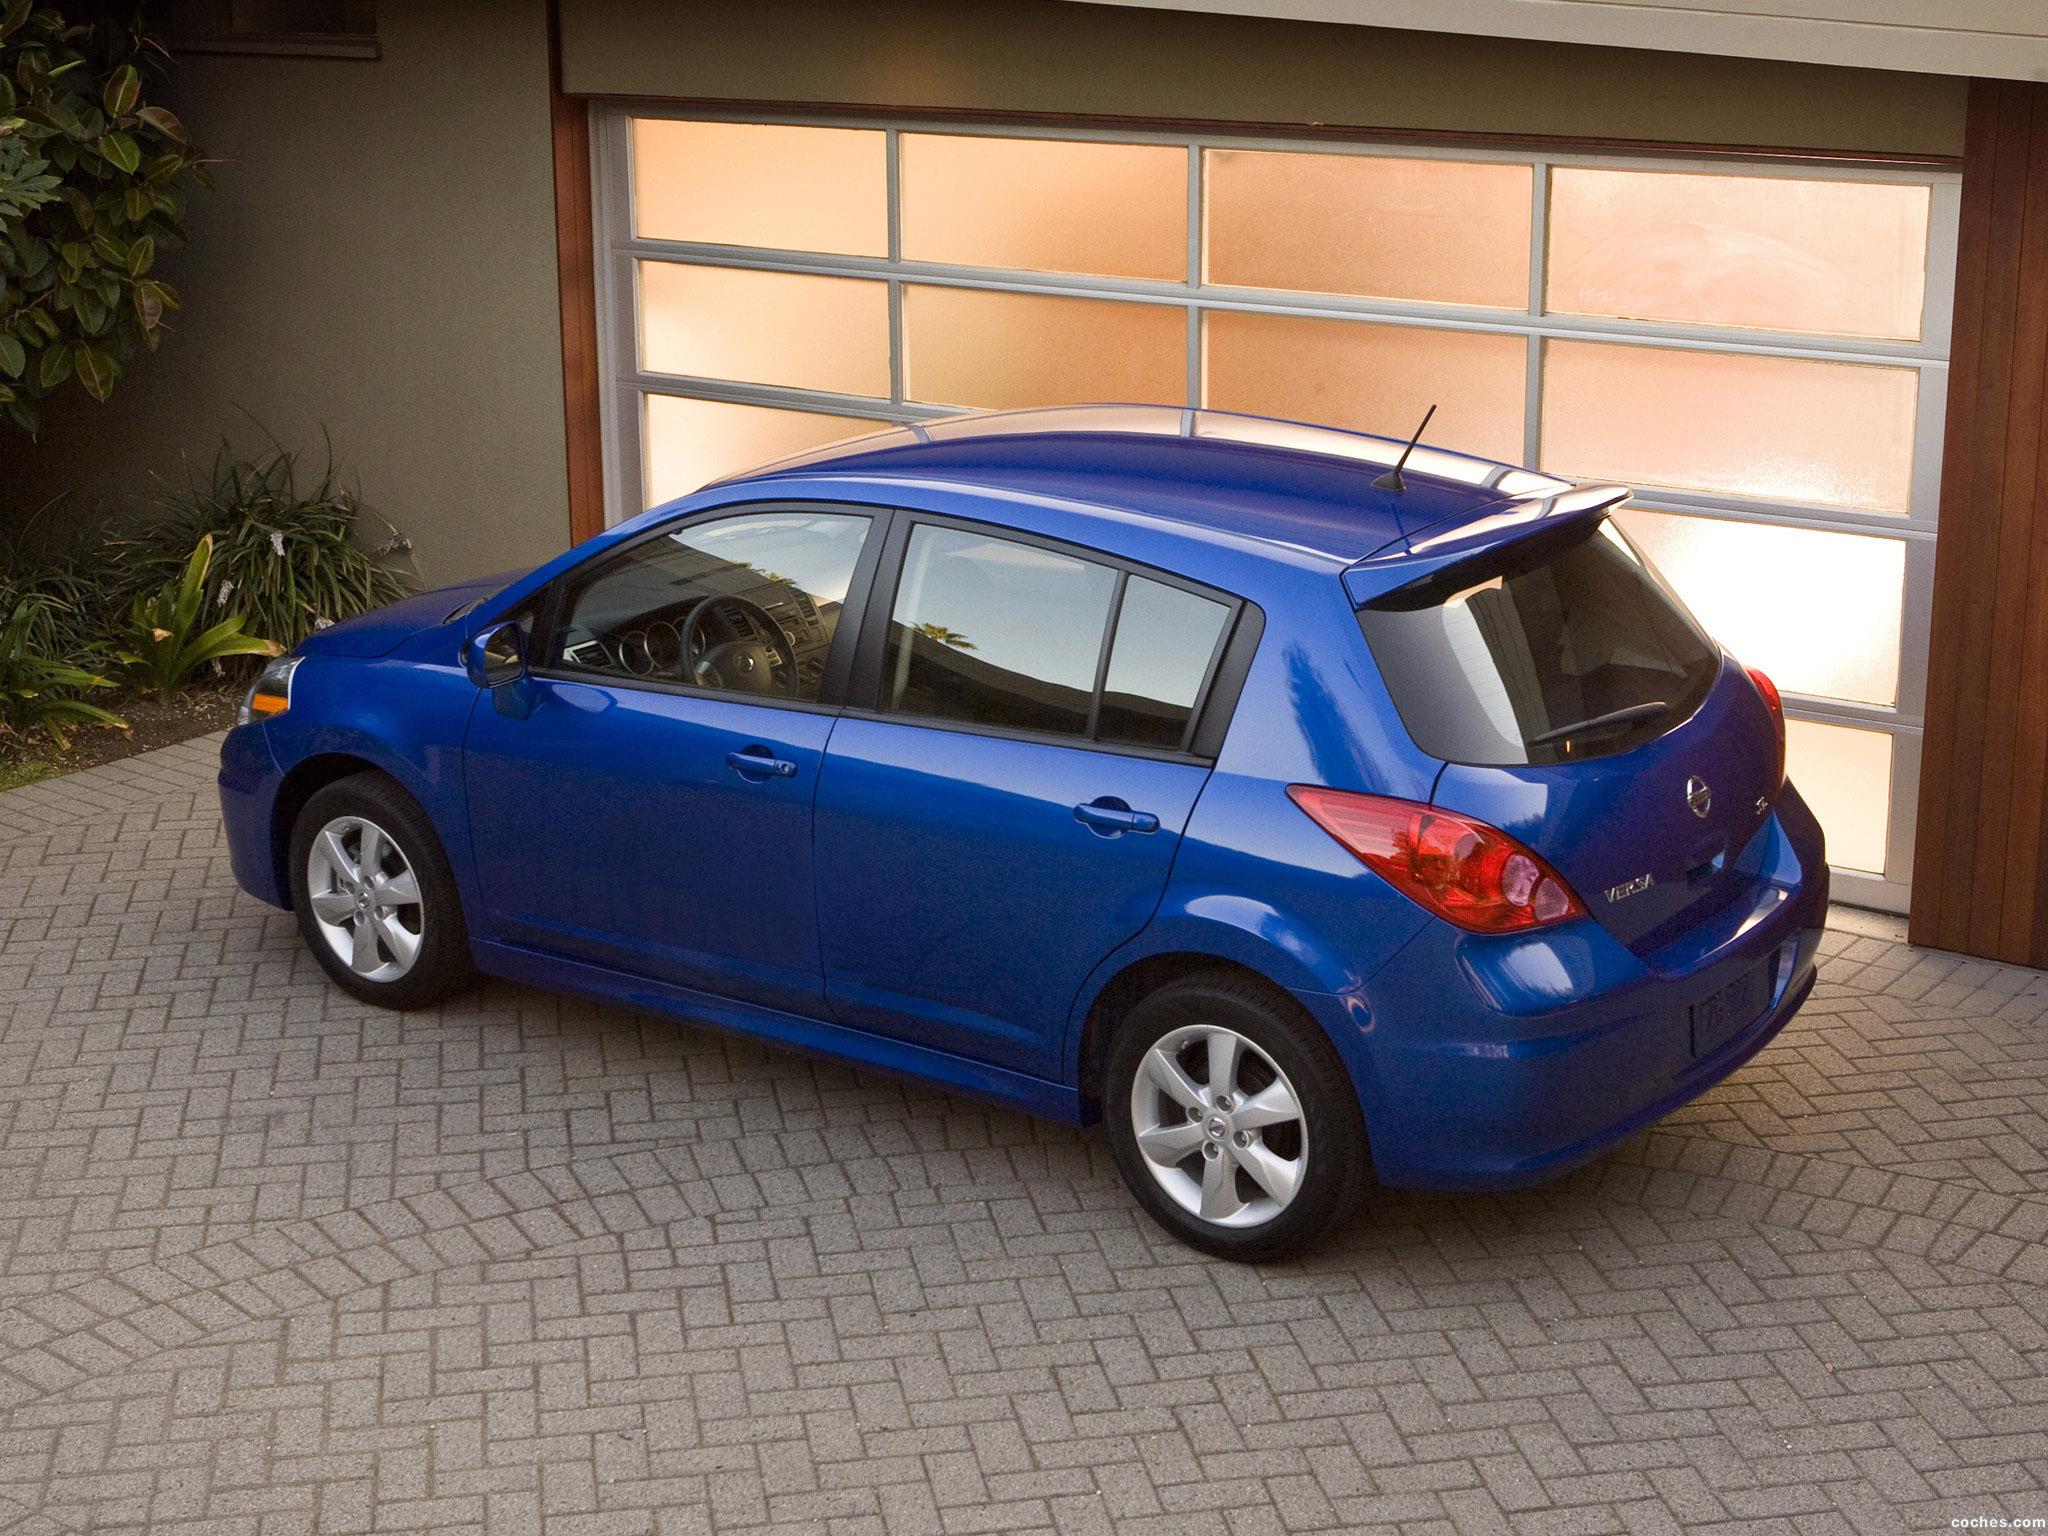 Foto 2 de Nissan Versa Hatchback 2009